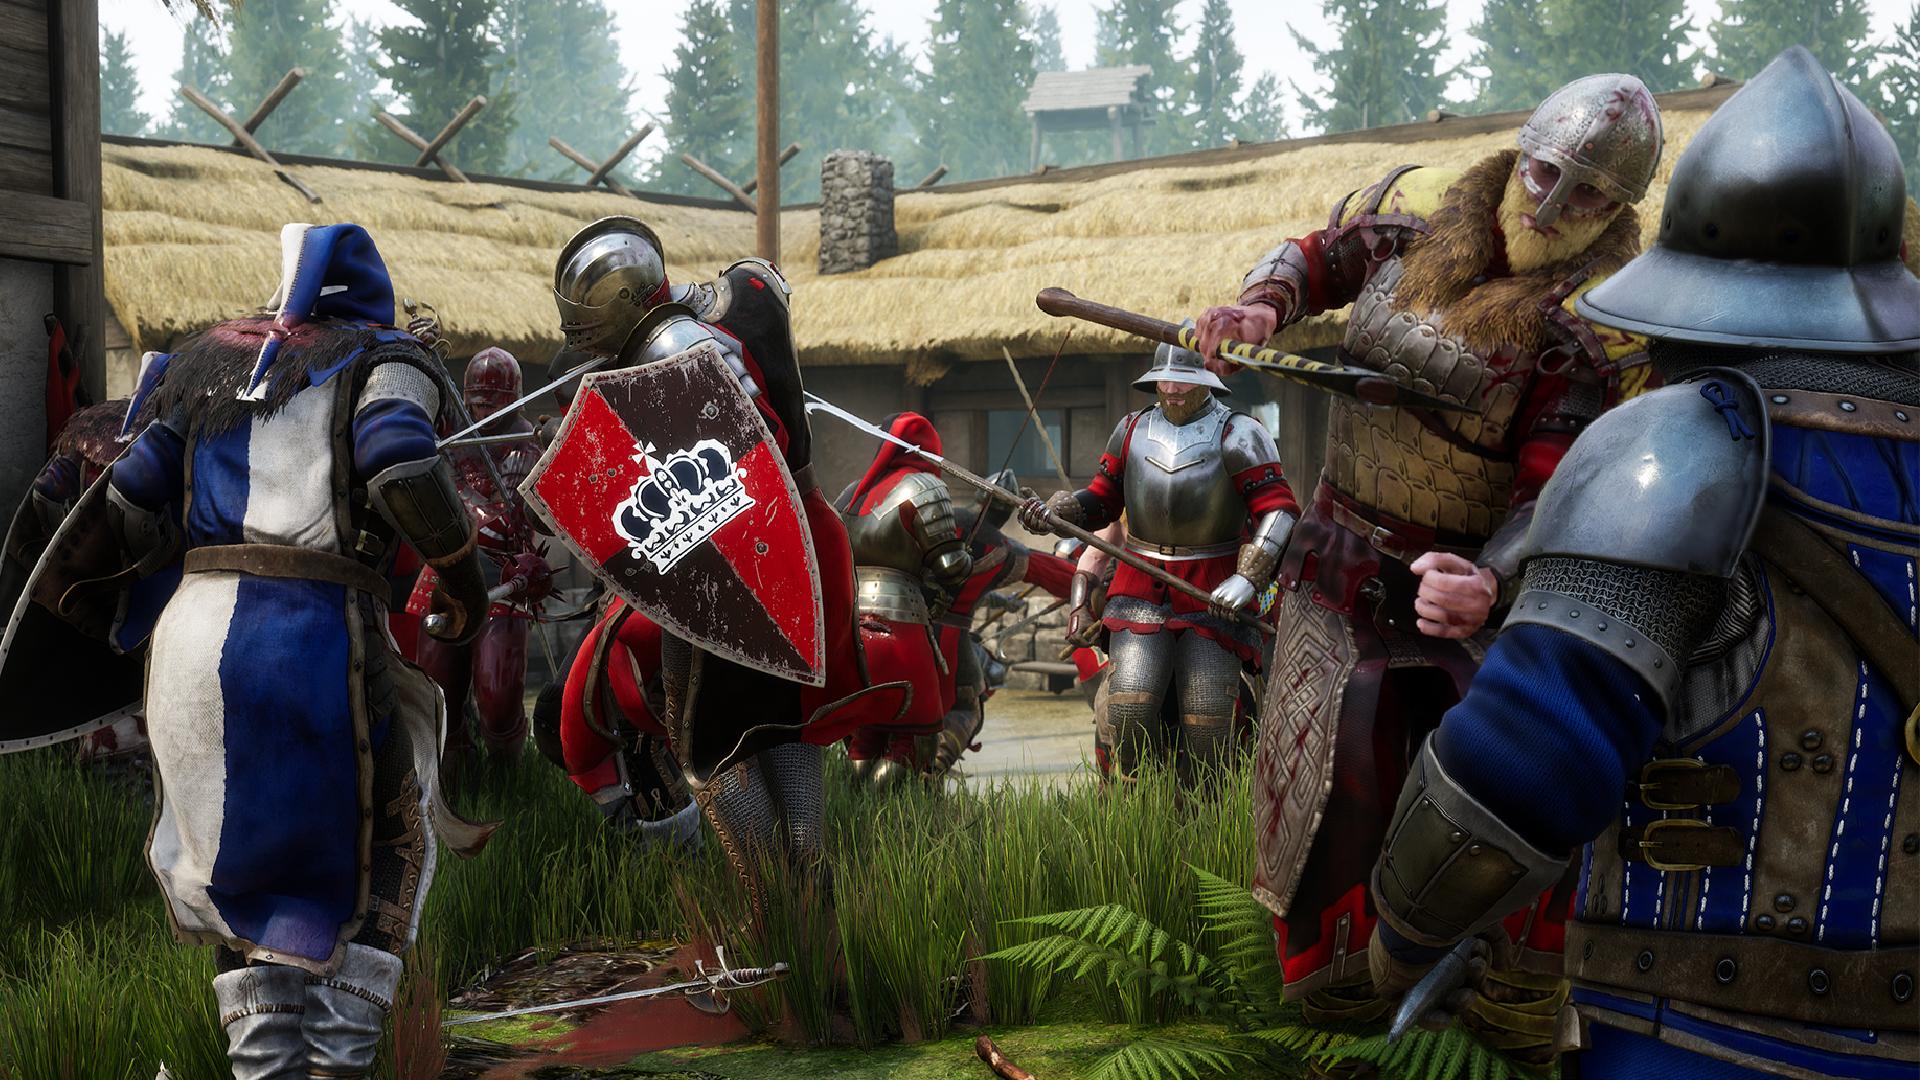 Mordhau players bust through map, reach character select screen